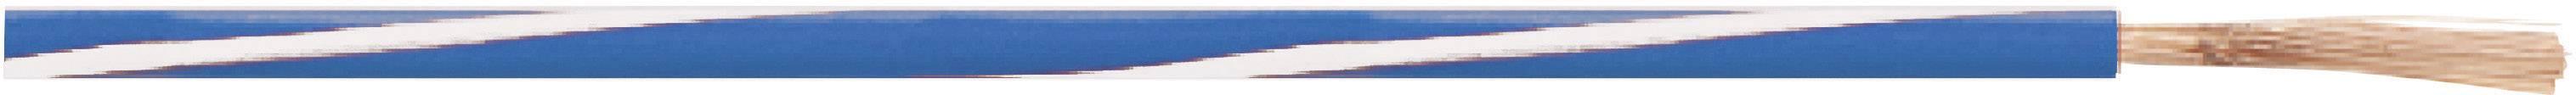 Opletenie / lanko LappKabel 4512442S X05V-K, 1 x 0.75 mm², vonkajší Ø 2.40 mm, metrový tovar, biela, modrá